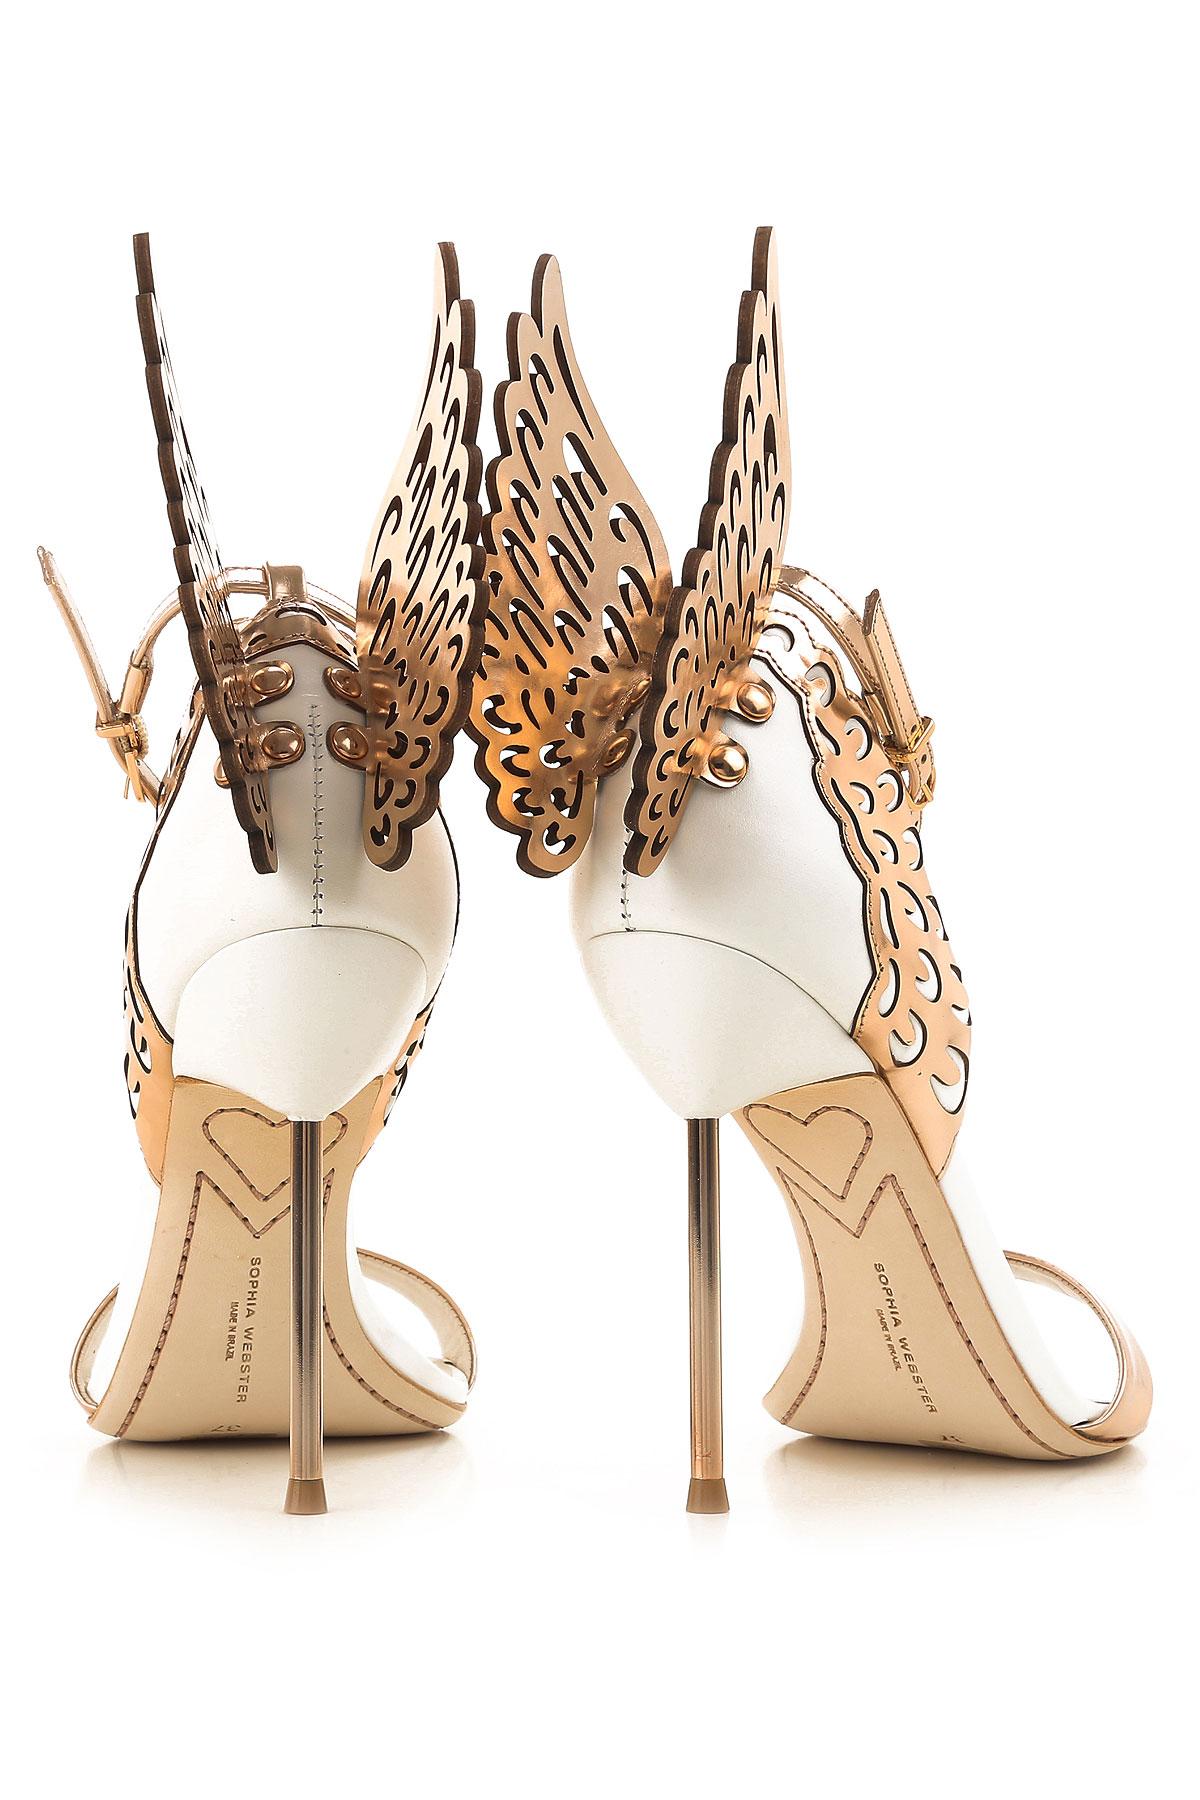 Webster Zapatos 19 Para invierno 2018 Otoño Oro Blanco Sophia Rosa Mujer dq6RwEPd5